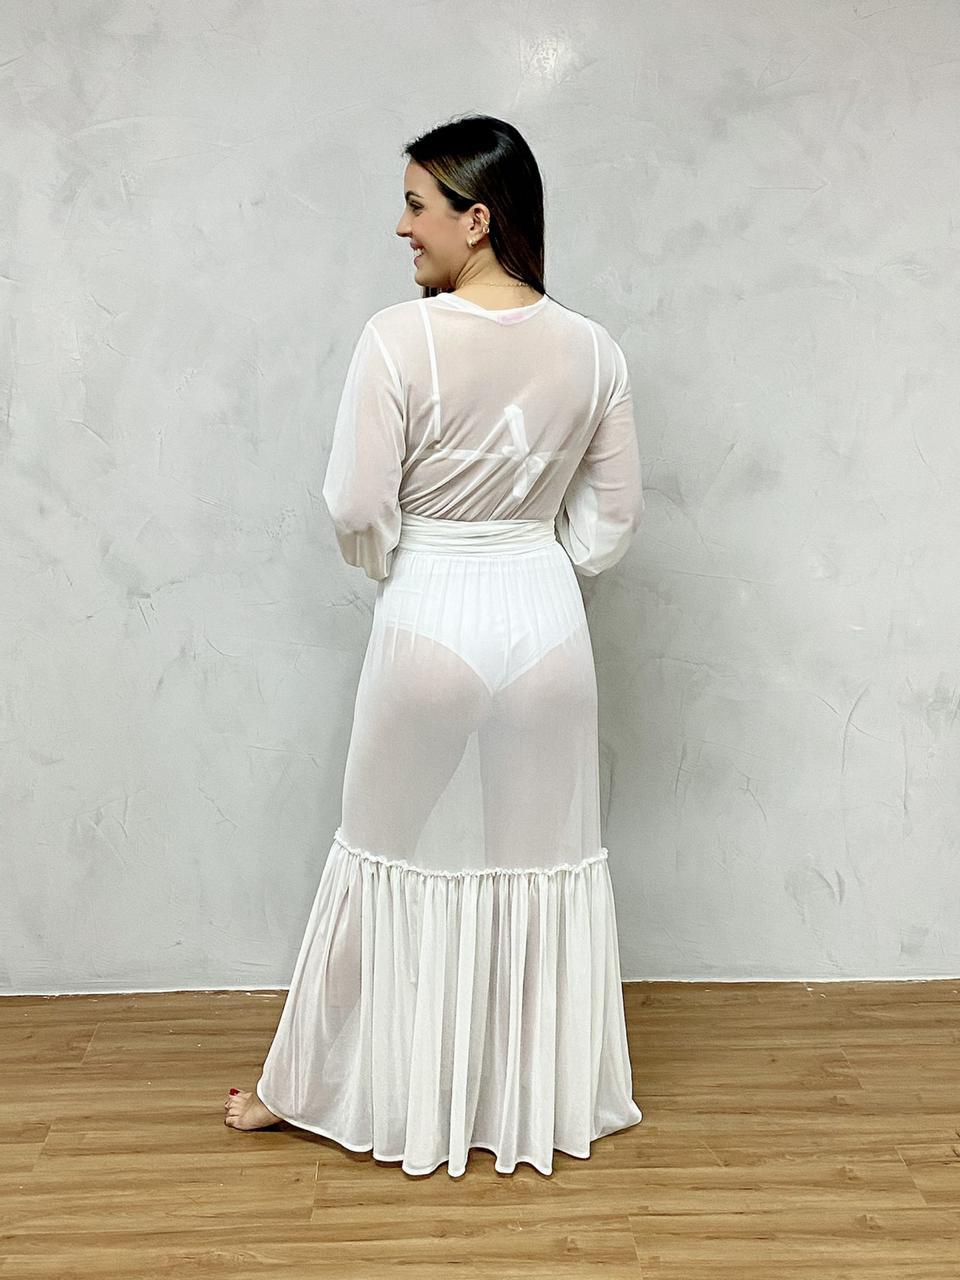 Vestido Longo Manga Elástico Branco   - RMCE BRAZIL